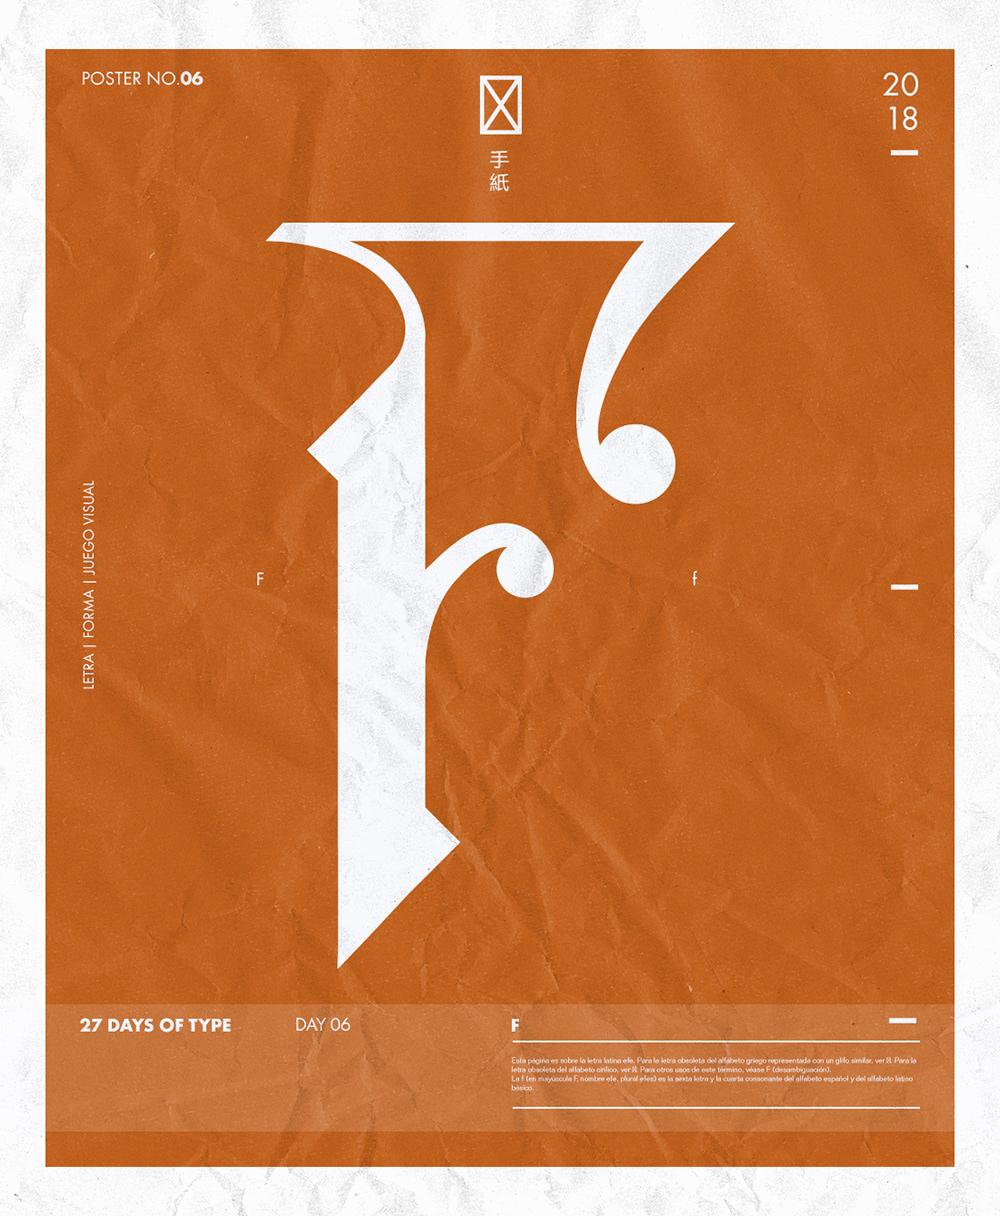 Fernando Forero - 27 DAYS OF TYPE